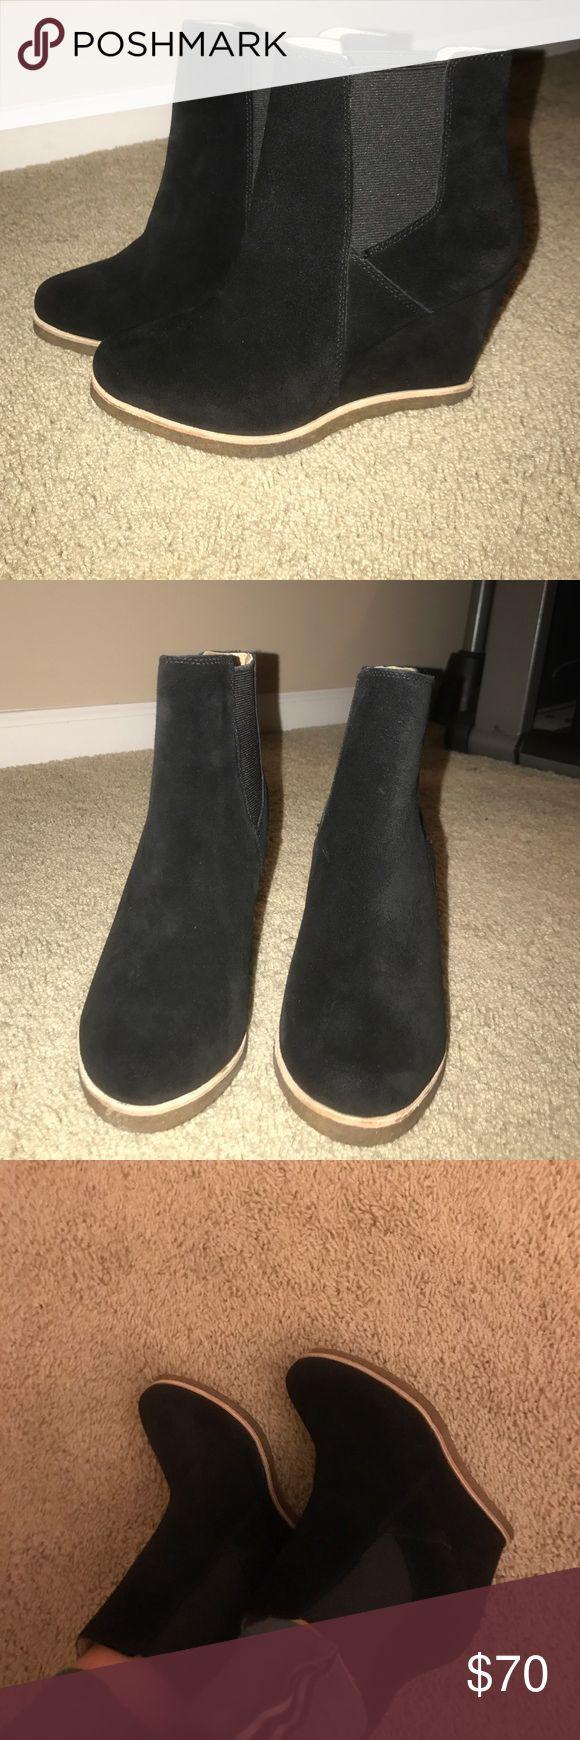 "Splendid ""Tara"" booties Black suede booties. Never worn. Extremely comfortable! Splendid Shoes Ankle Boots & Booties"